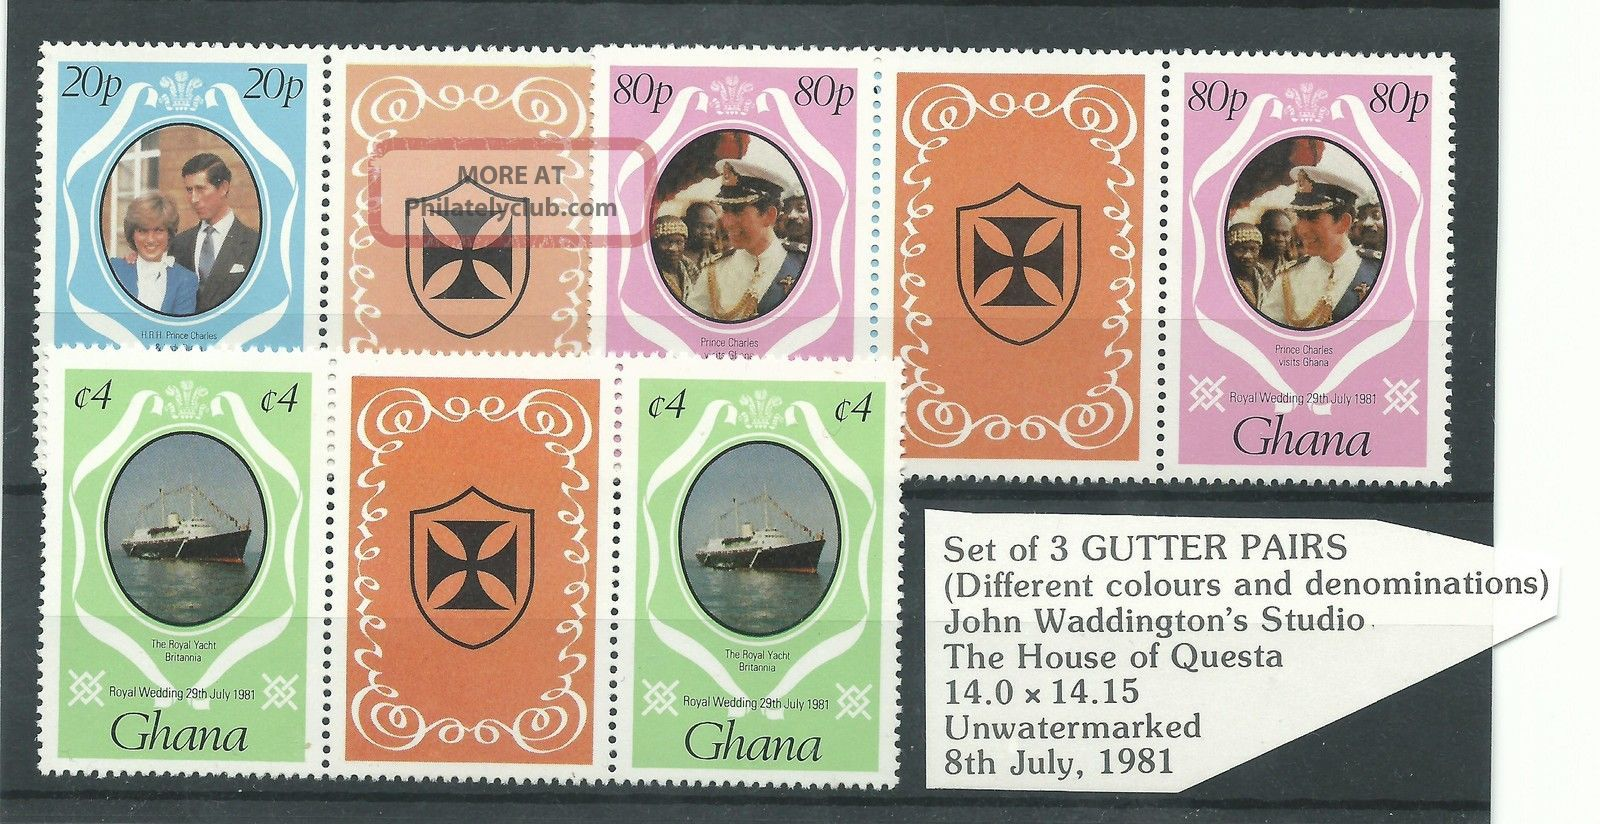 Ghana - 1981 - Gutter Pairs - Charles & Diana Wedding - Umm Africa photo